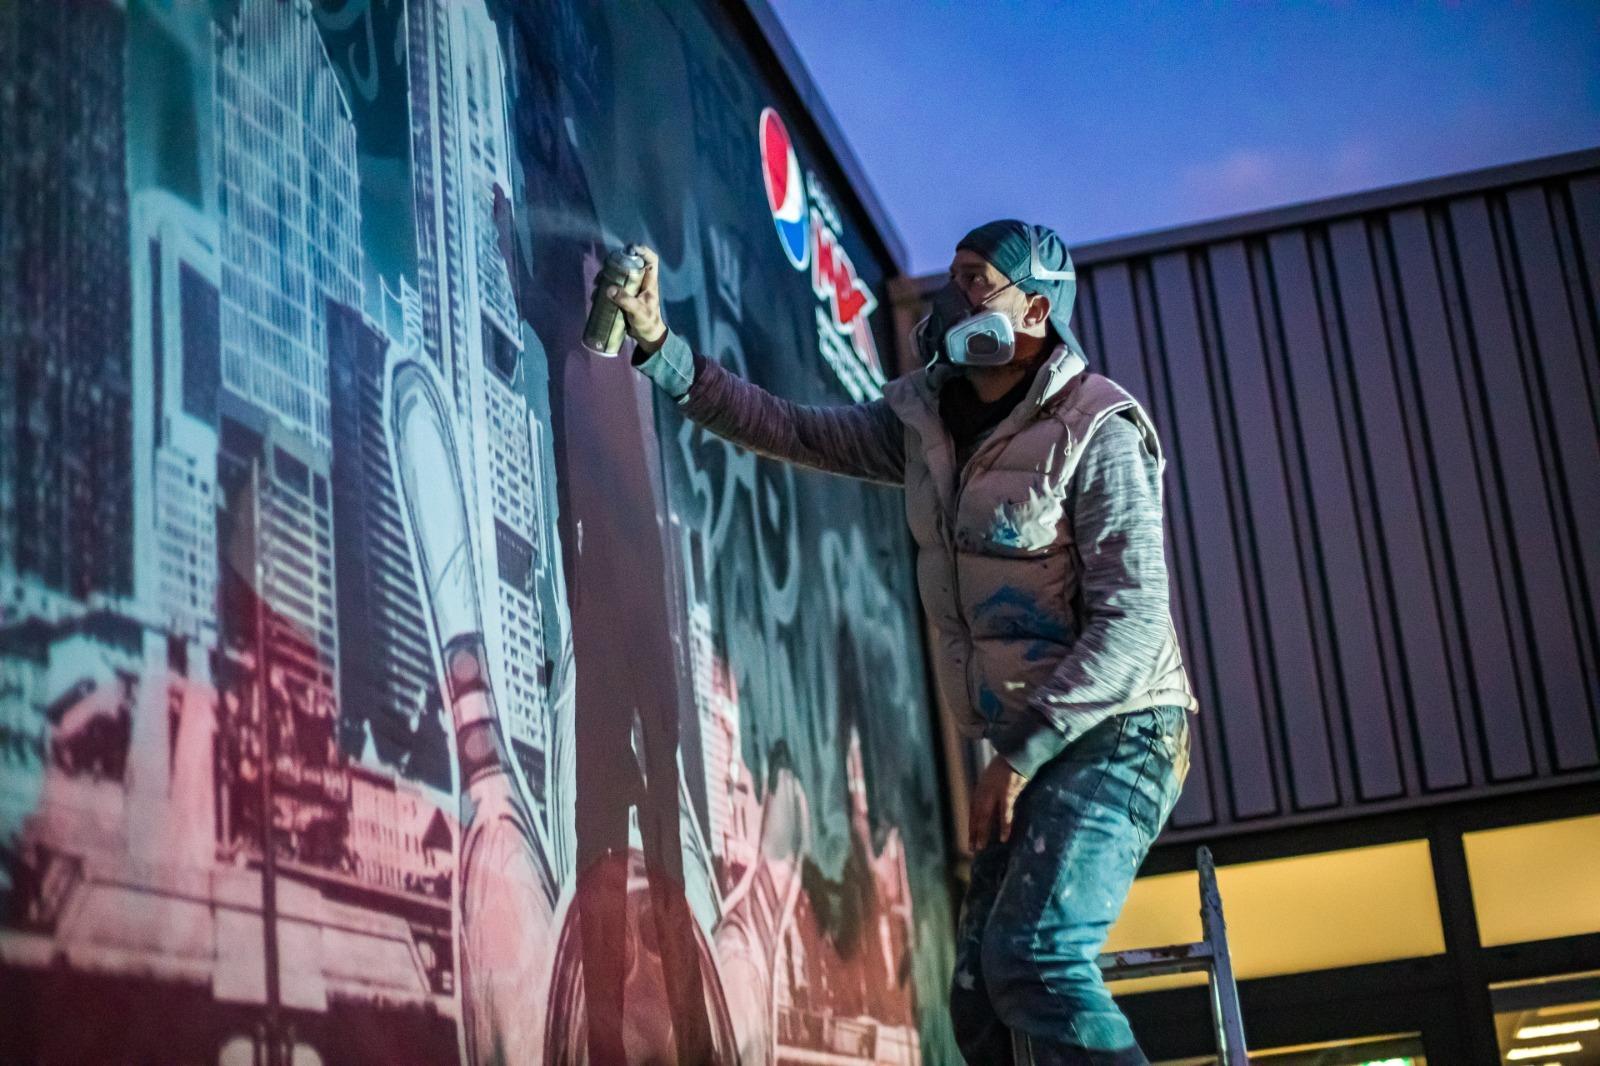 Radeberger_Pepsi_Max_Bowl_for_Fun_Langen_2020_aussen_graffiti_bowling_kegel_trashig_skyline_frankfurt-07_graffitiauftrag_graffitikuenstler_artmos4